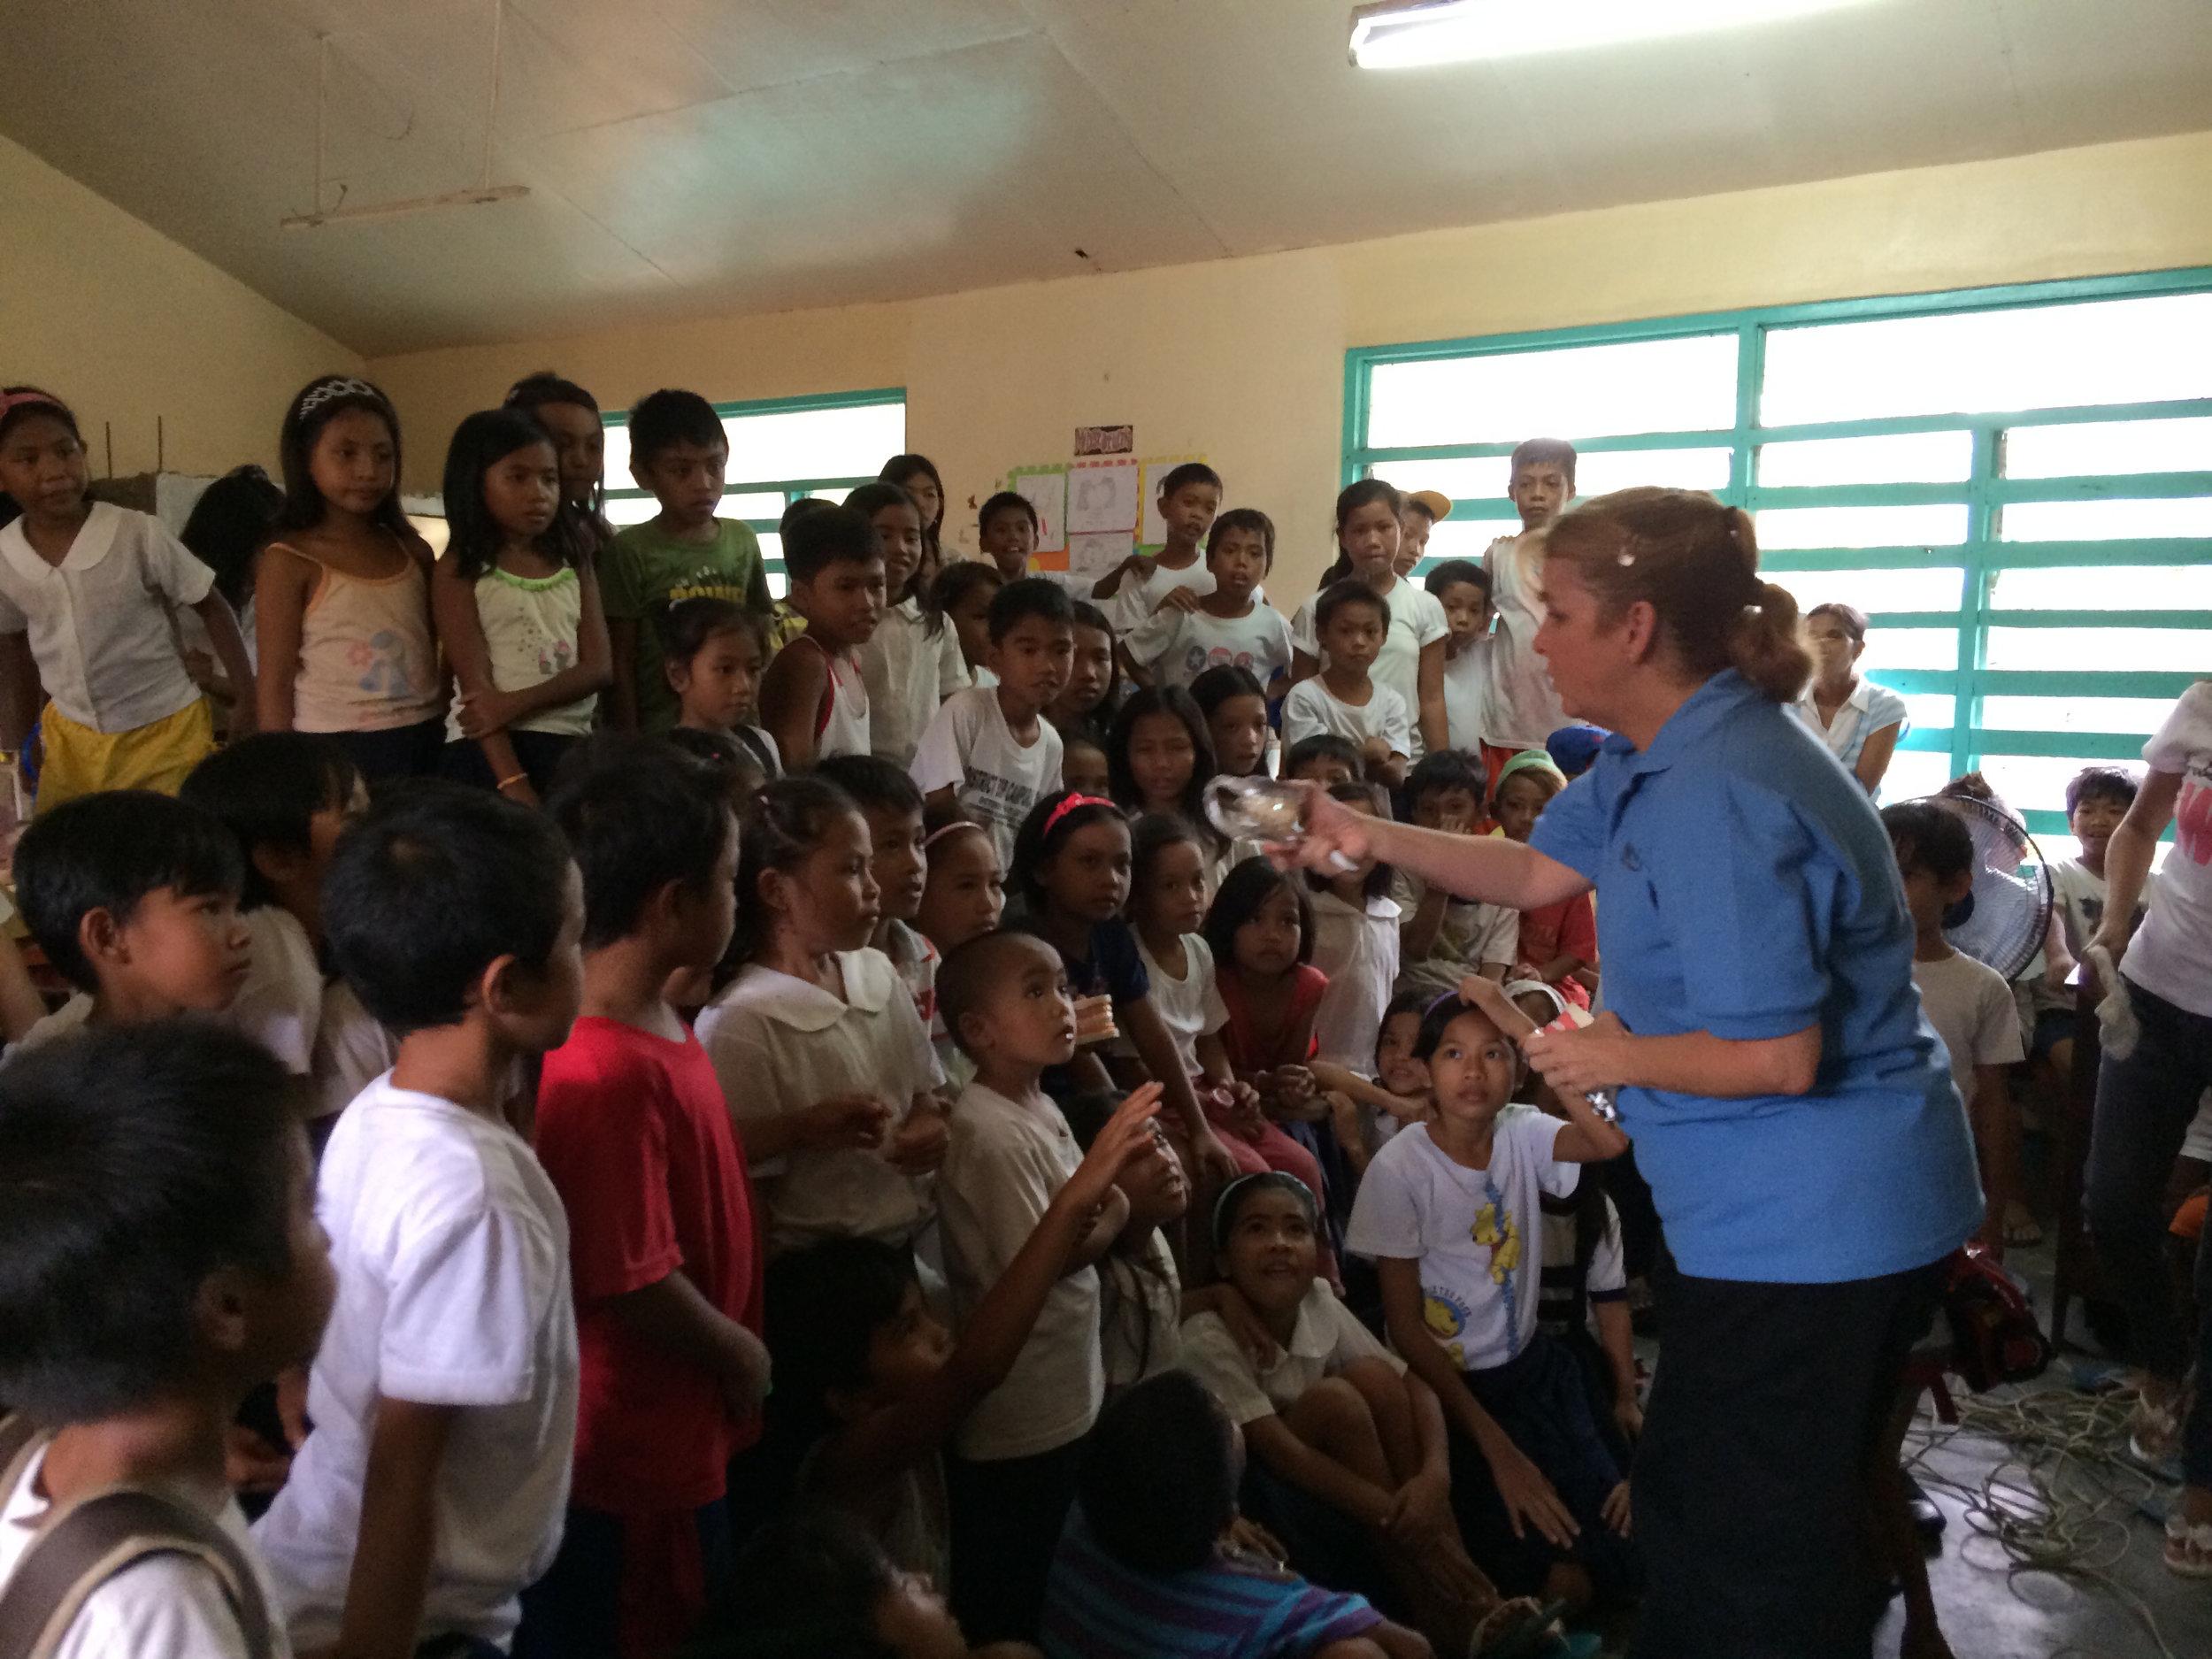 Vicki Brett addressing students at an elementary school